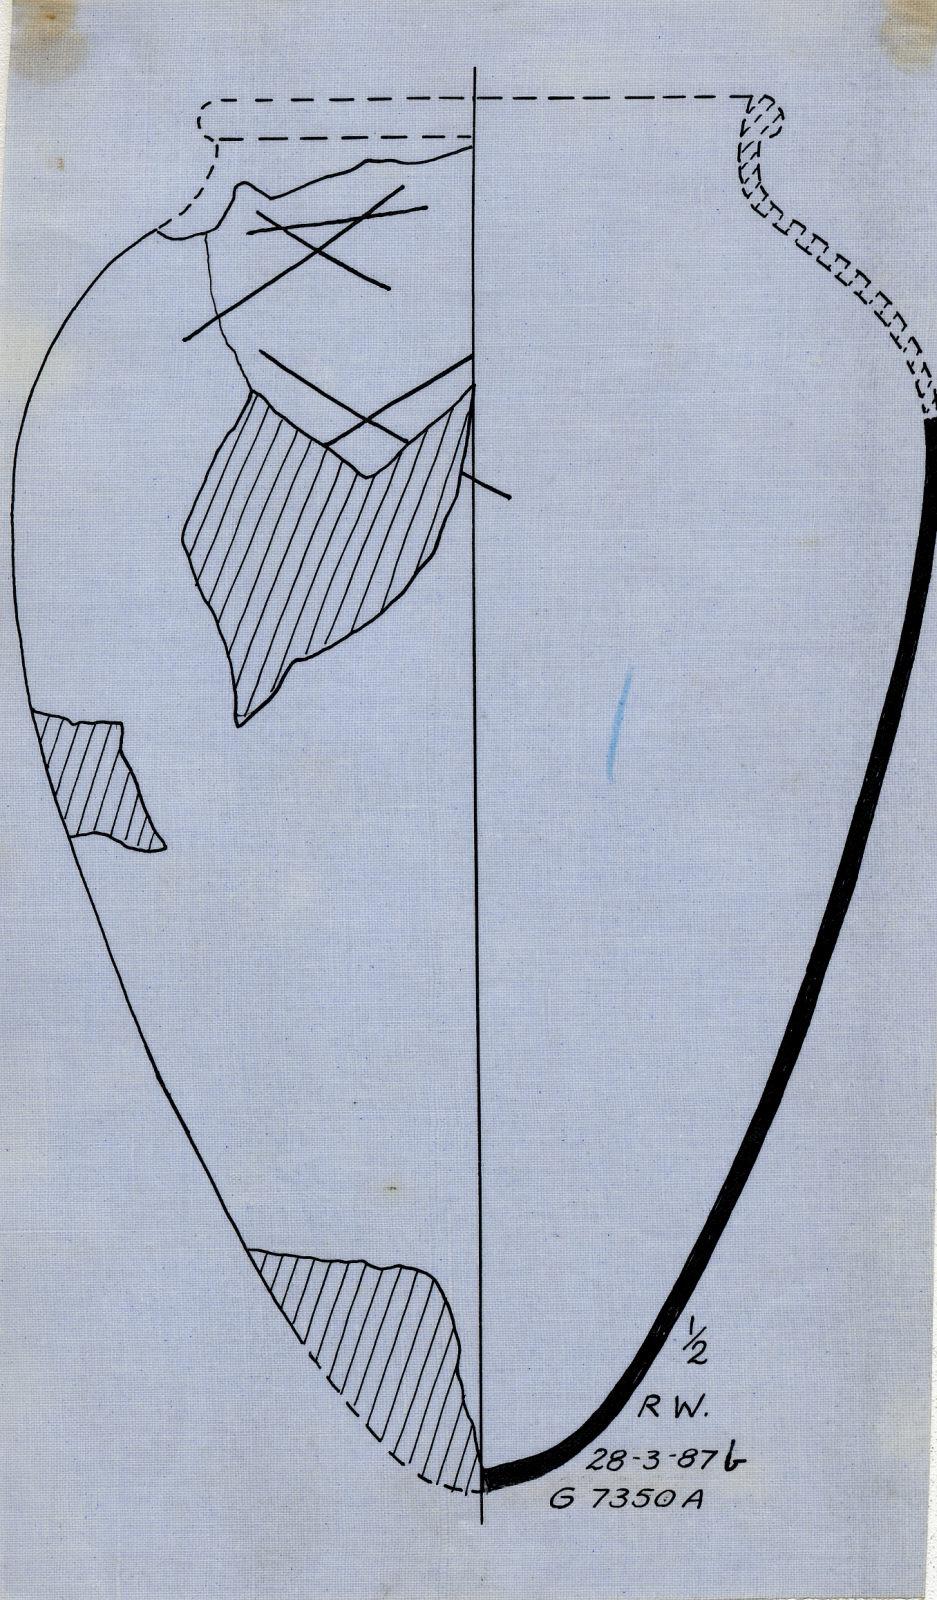 Drawings: G 7350, Shaft A: pottery, jar